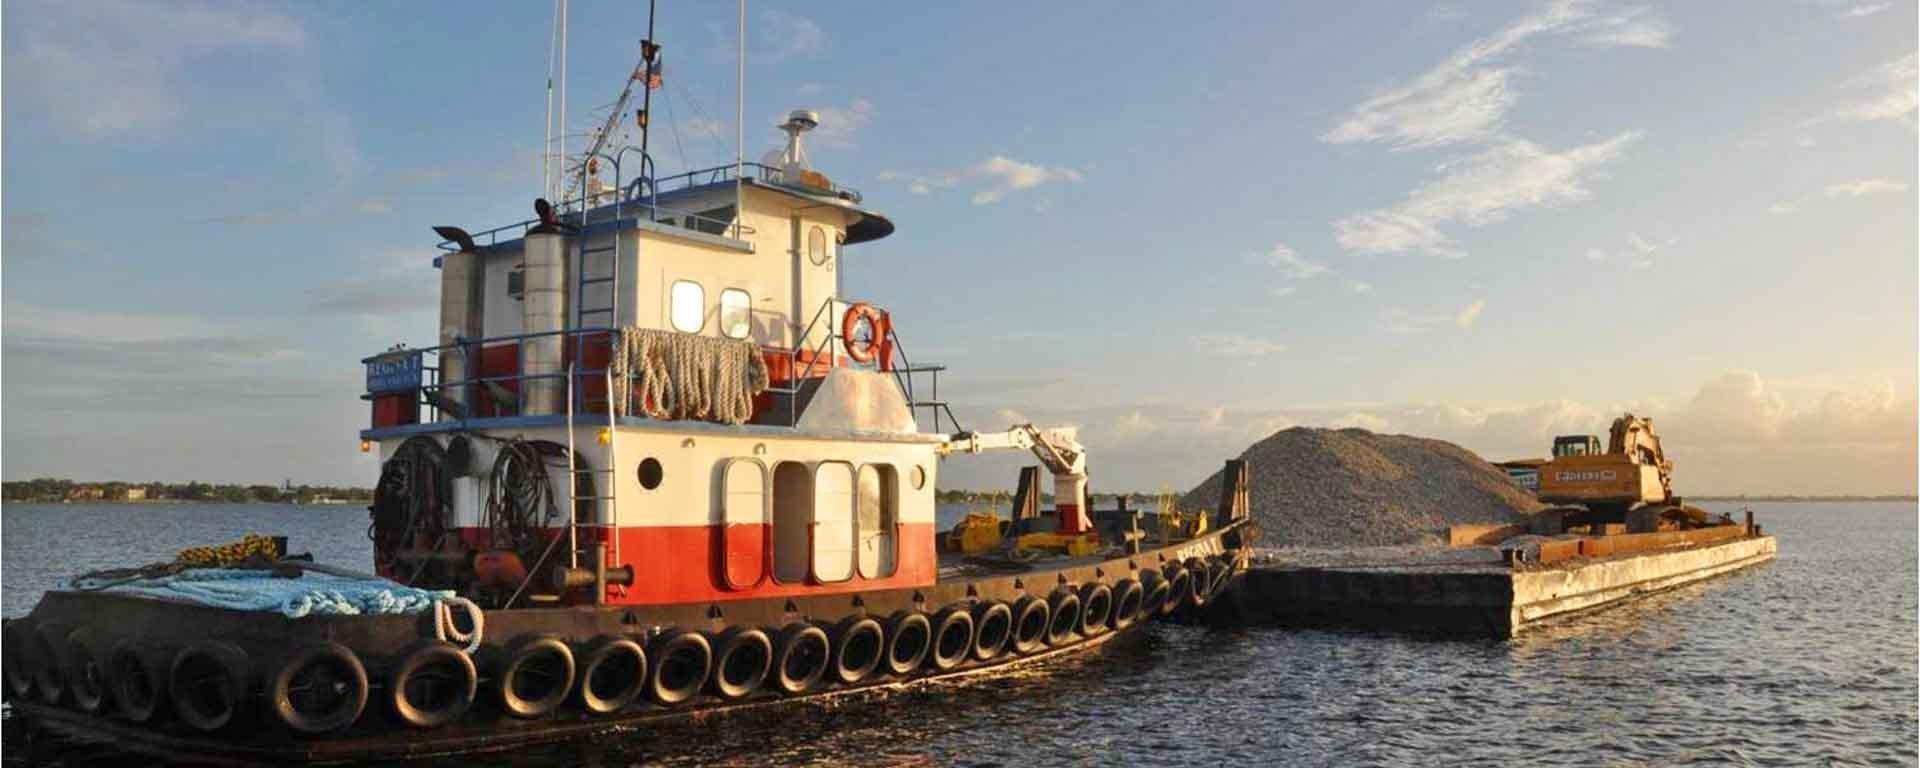 Oyster Deployment